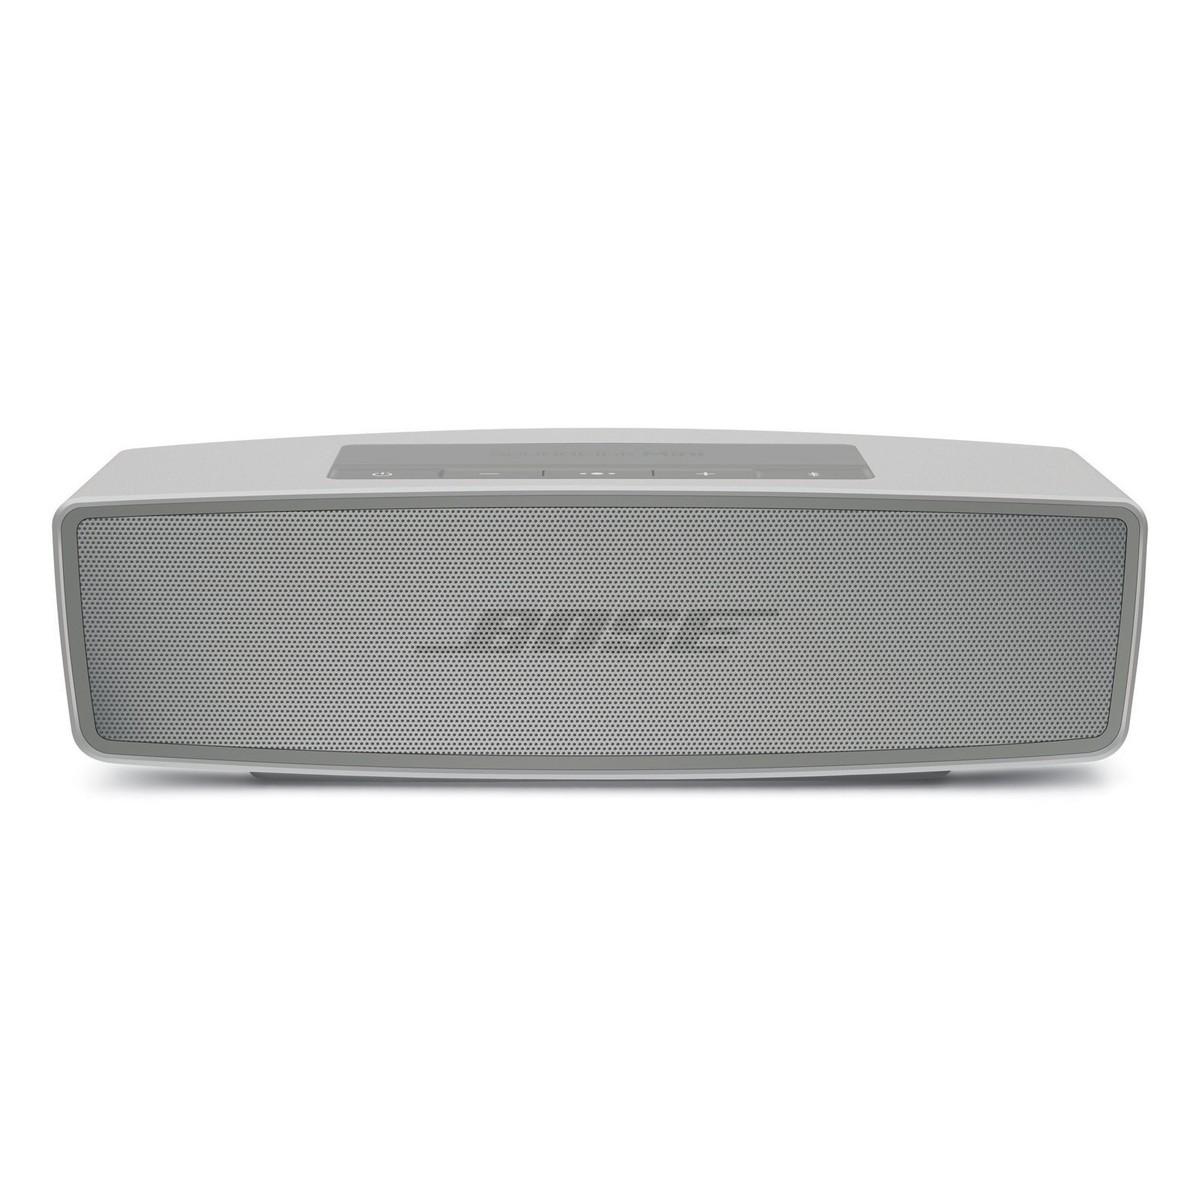 Bose Soundlink Mini II Bluetooth Speaker. Pearl at Gear4music.com